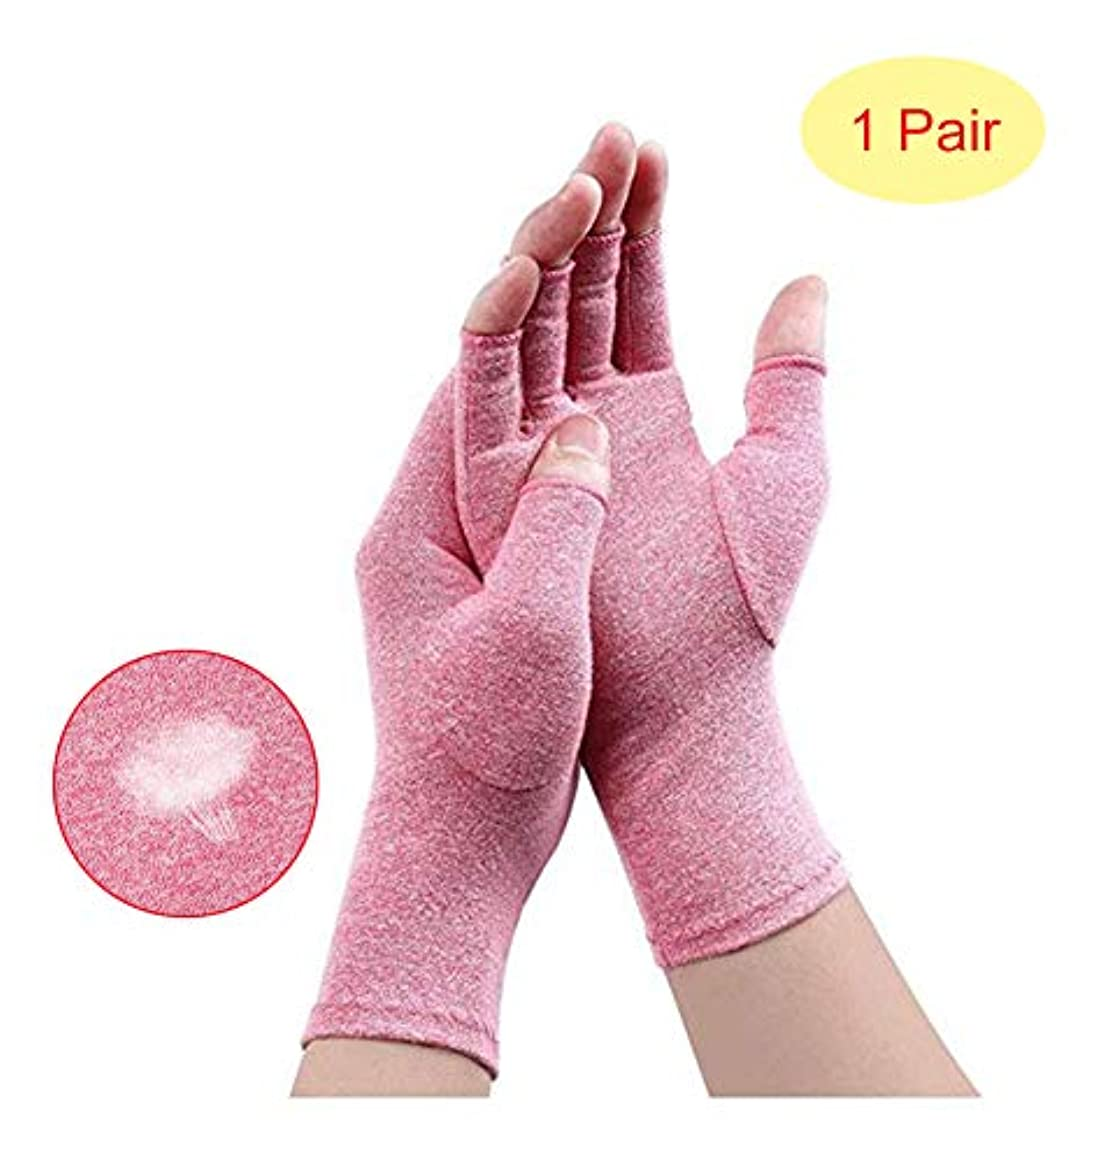 頂点休憩教会関節炎手袋、ピンクの通気性、手と関節用の抗関節炎健康療法用圧縮手袋、痛みの軽減、毎日の仕事,1Pair,M